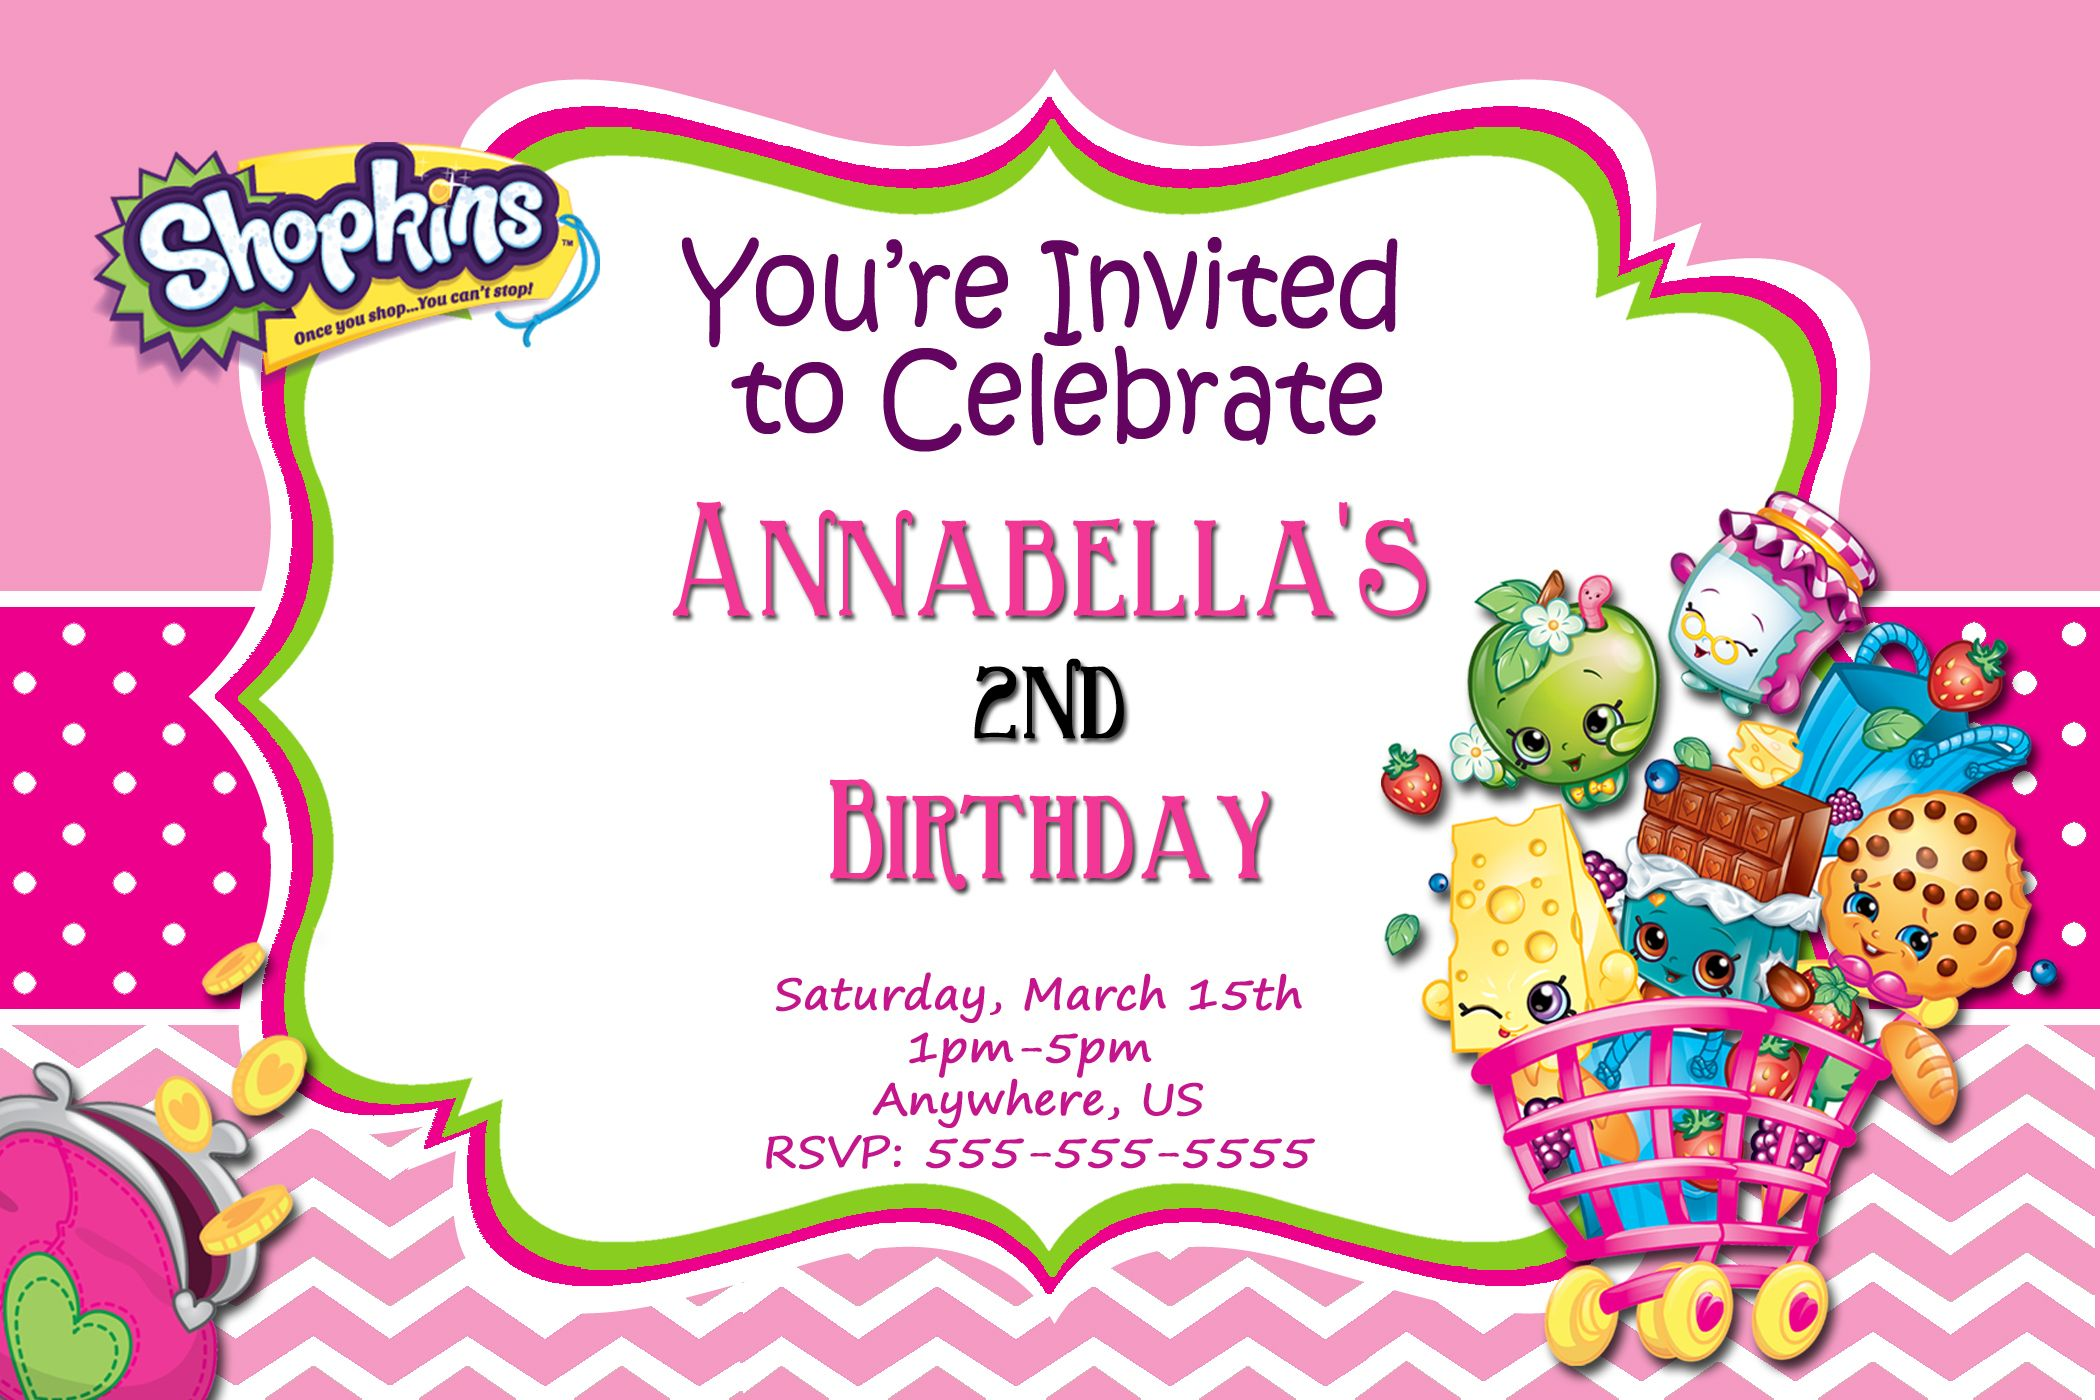 convite-2-shopkins   Shopkins, Fiestas and Birthdays